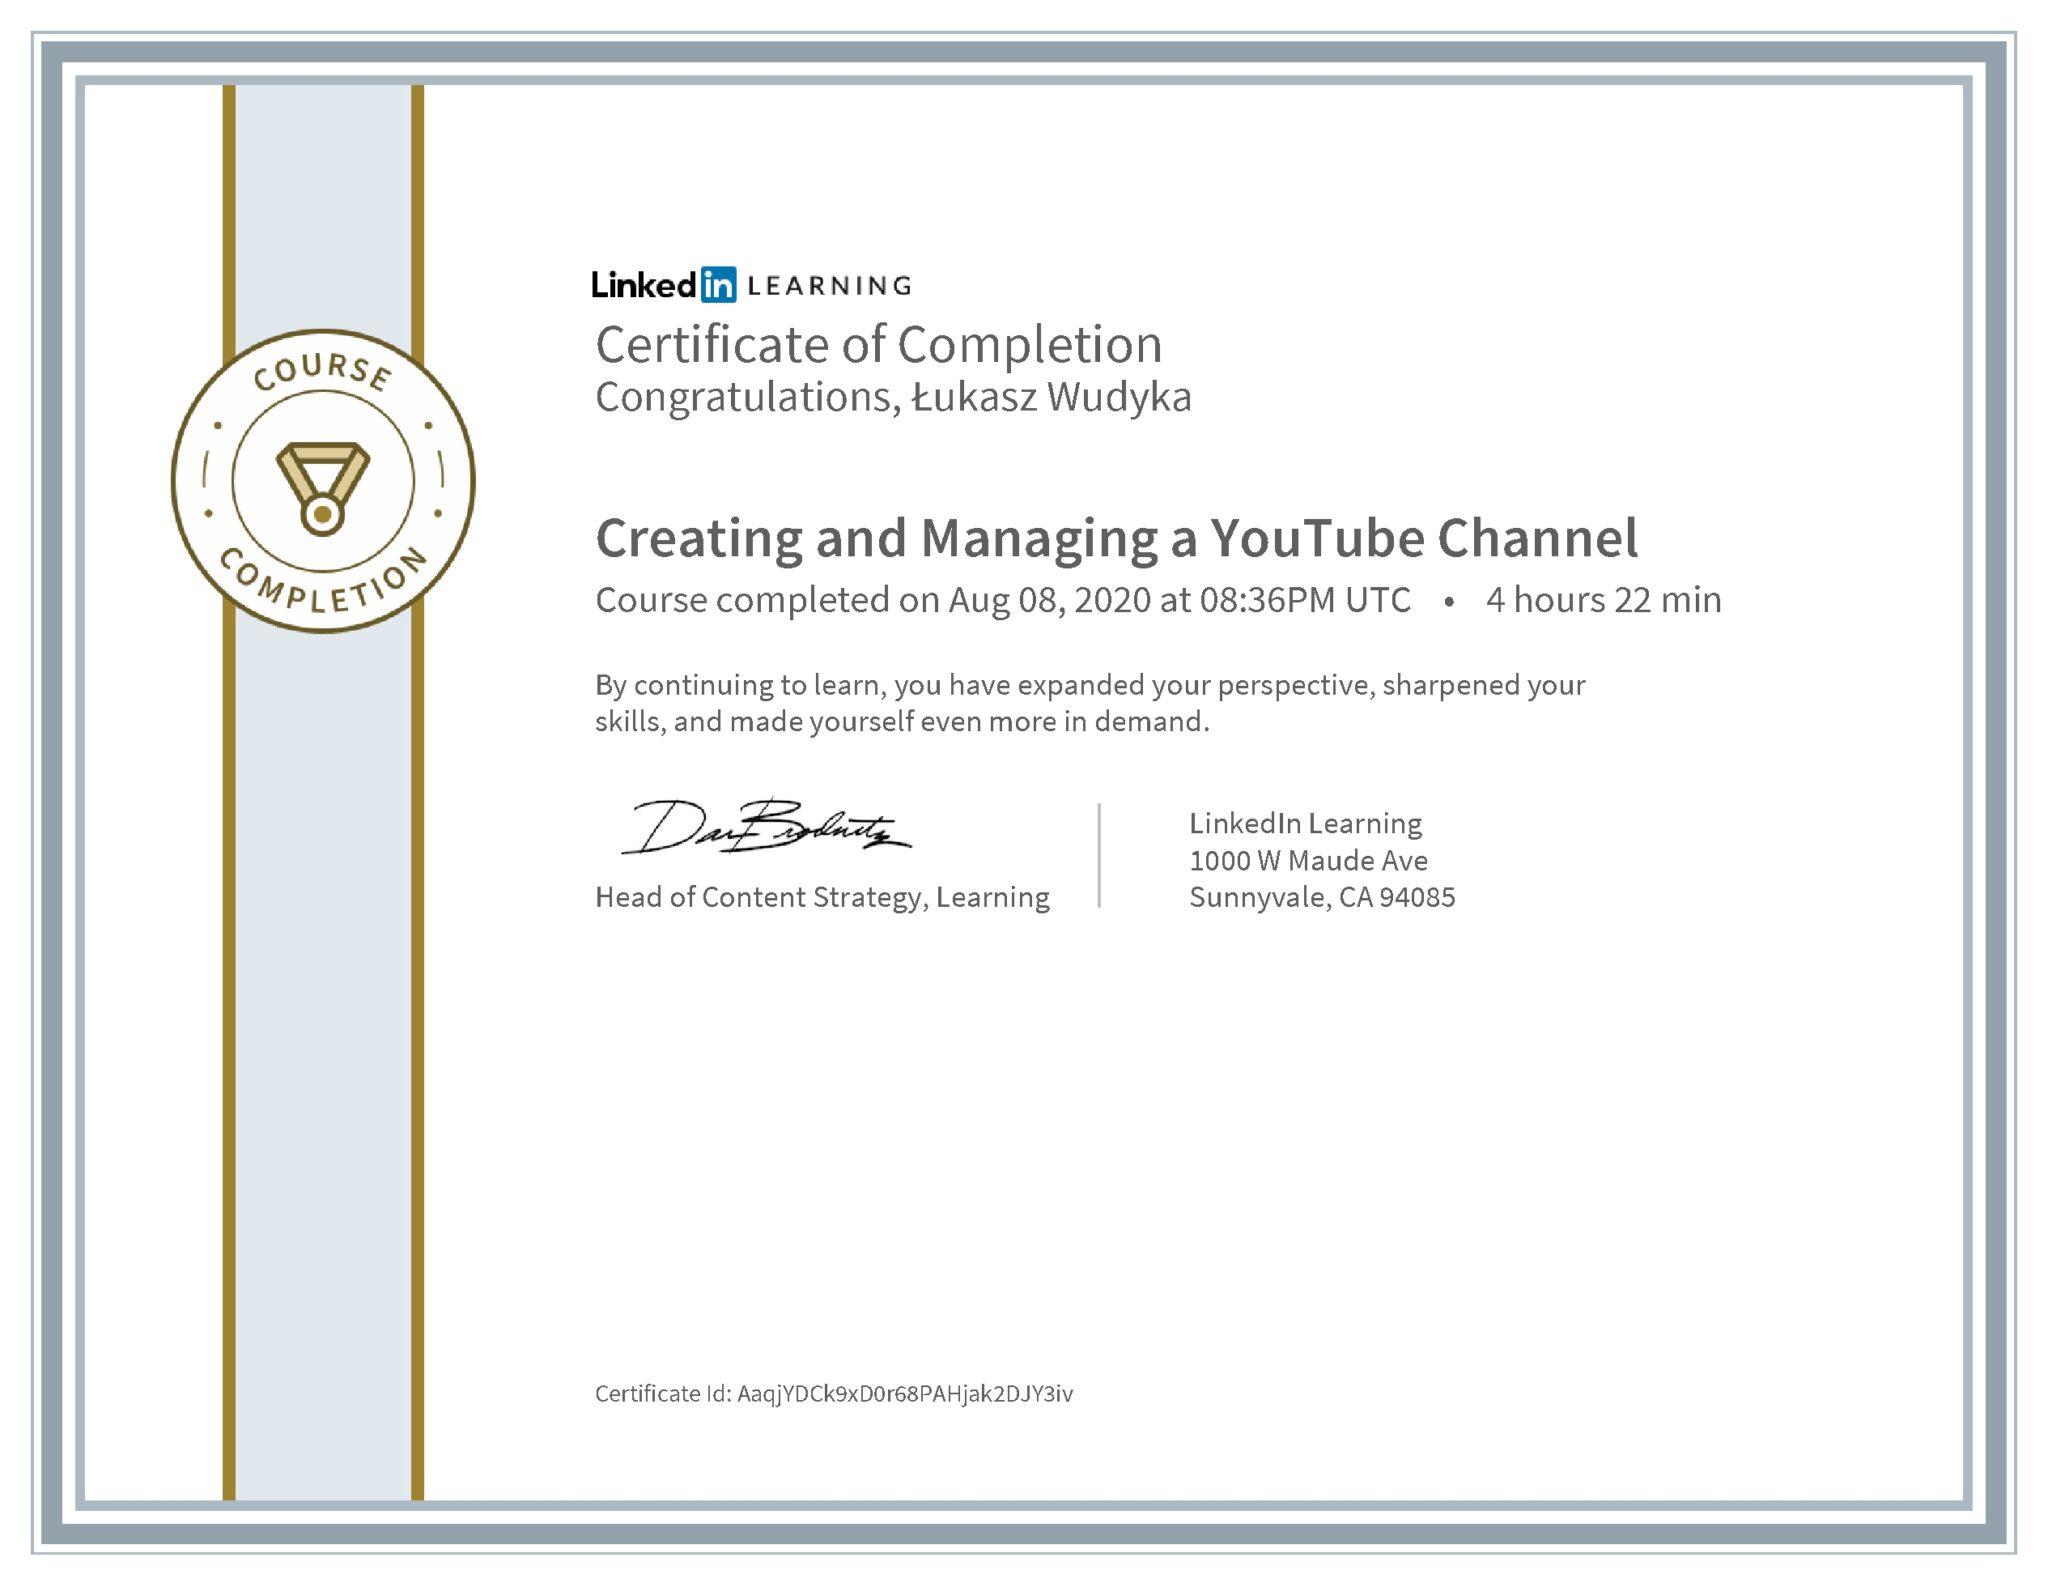 Łukasz Wudyka certyfikat LinkedIn Creating and Managing a YouTube Channel